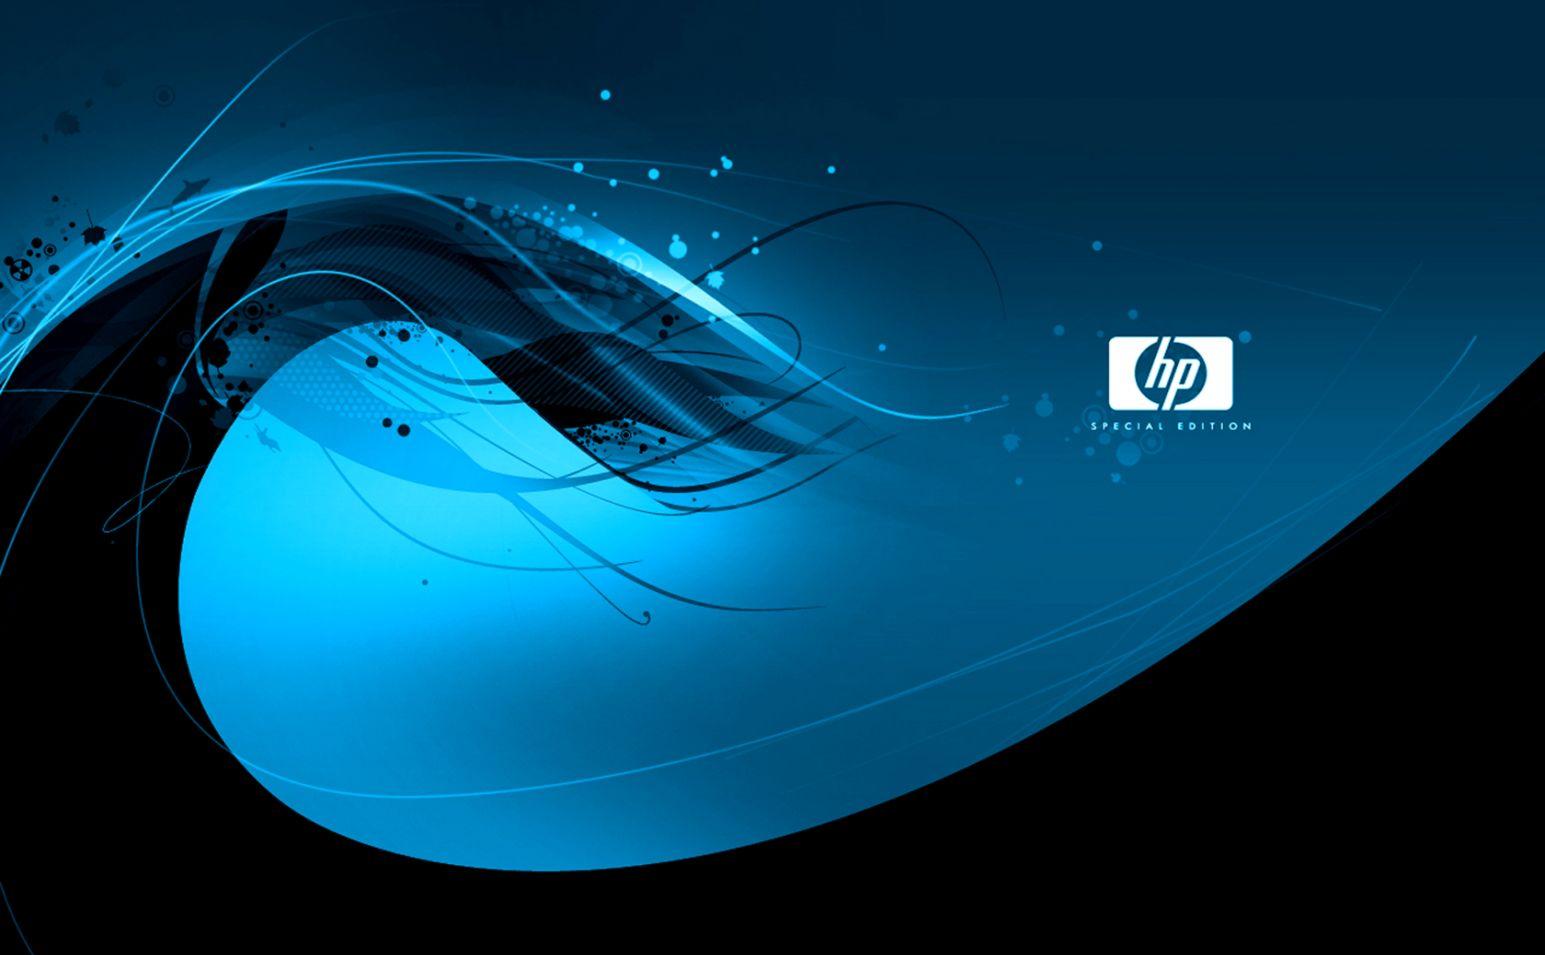 Download Lovely Blue Hp Wave Hd Theme Bin Customization Hd